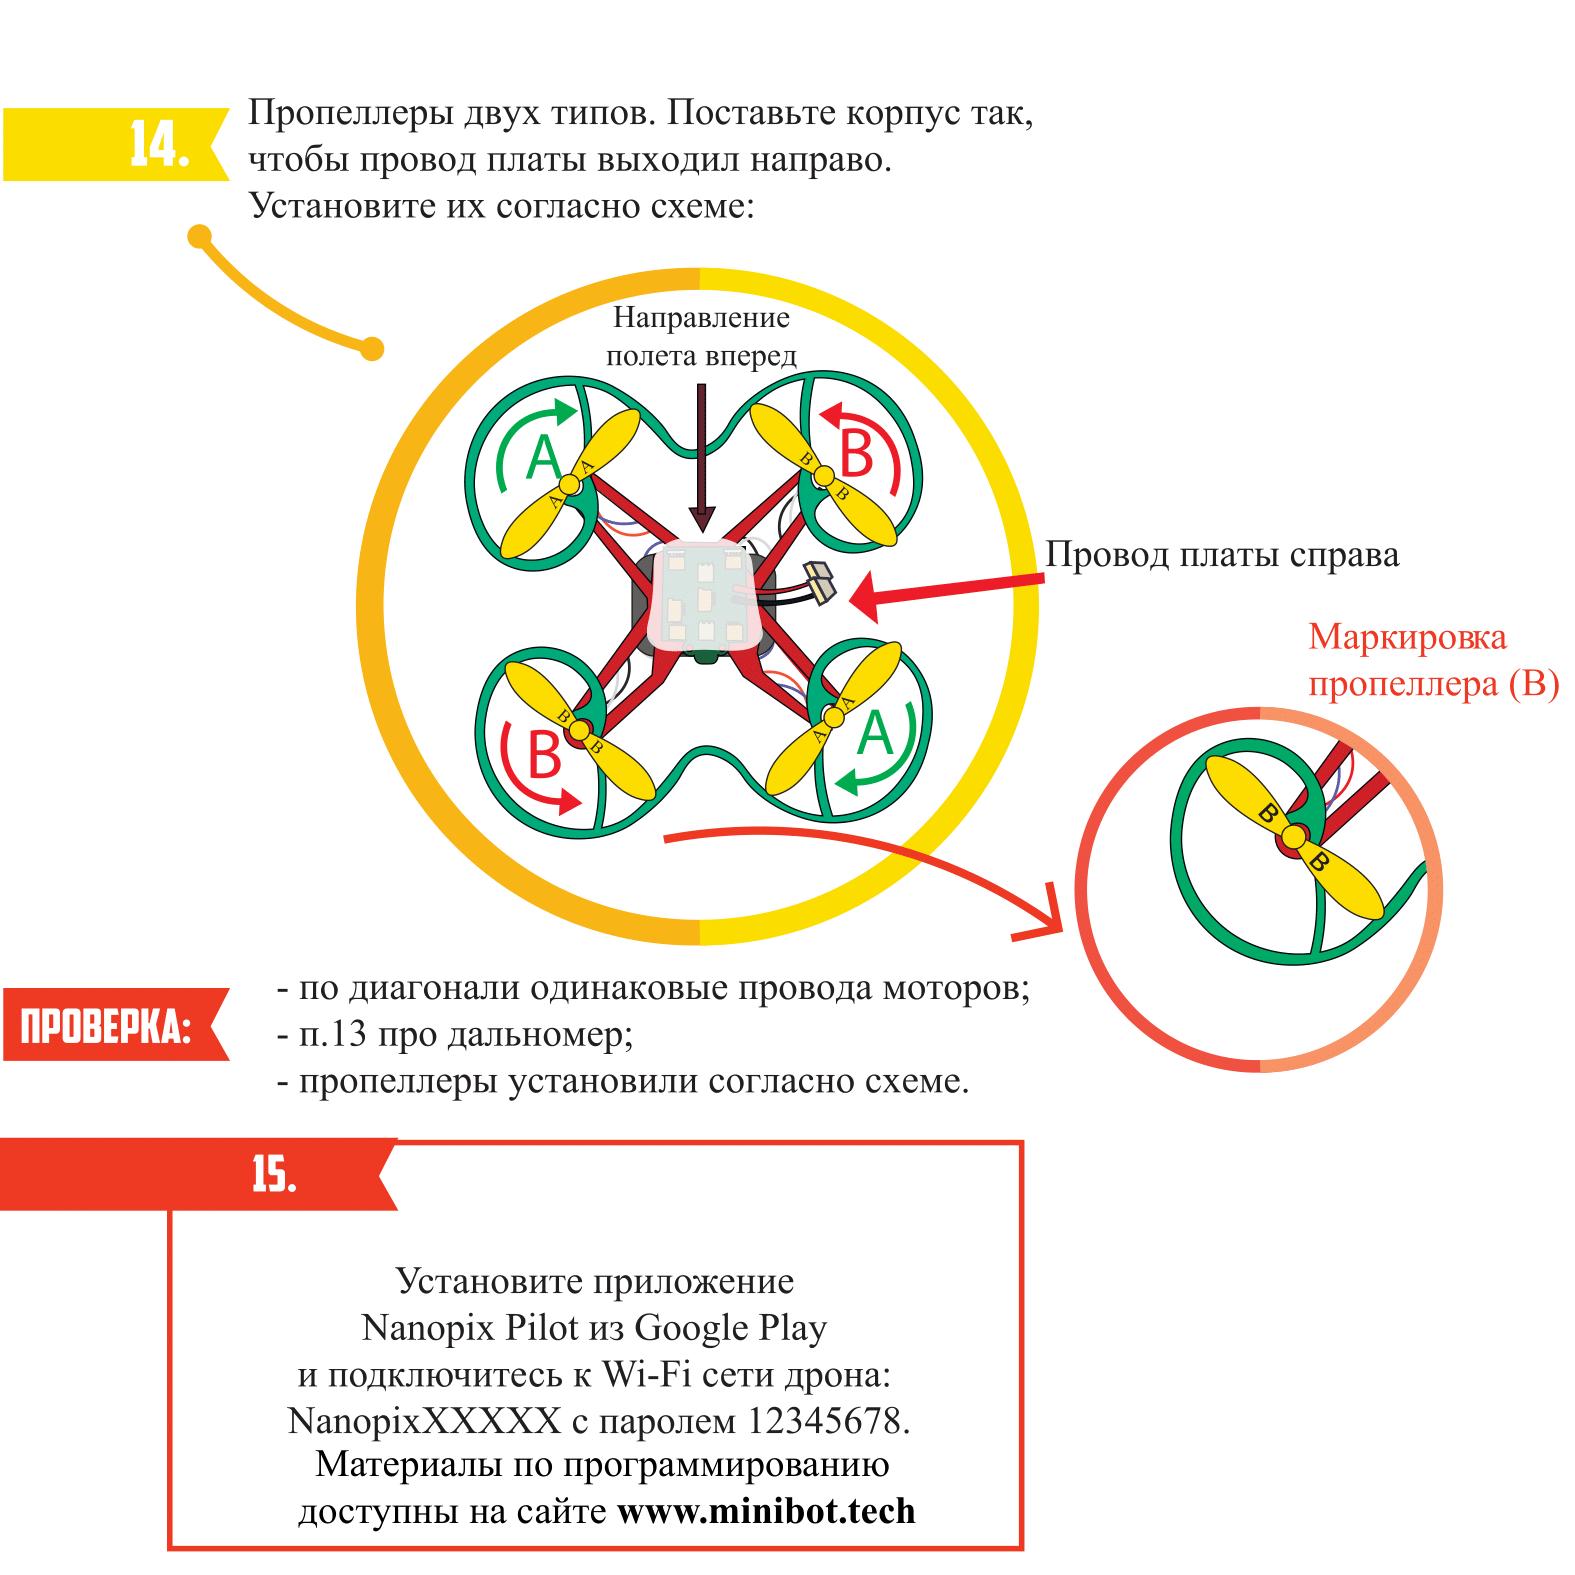 Сборка квадрокоптера Nanopix